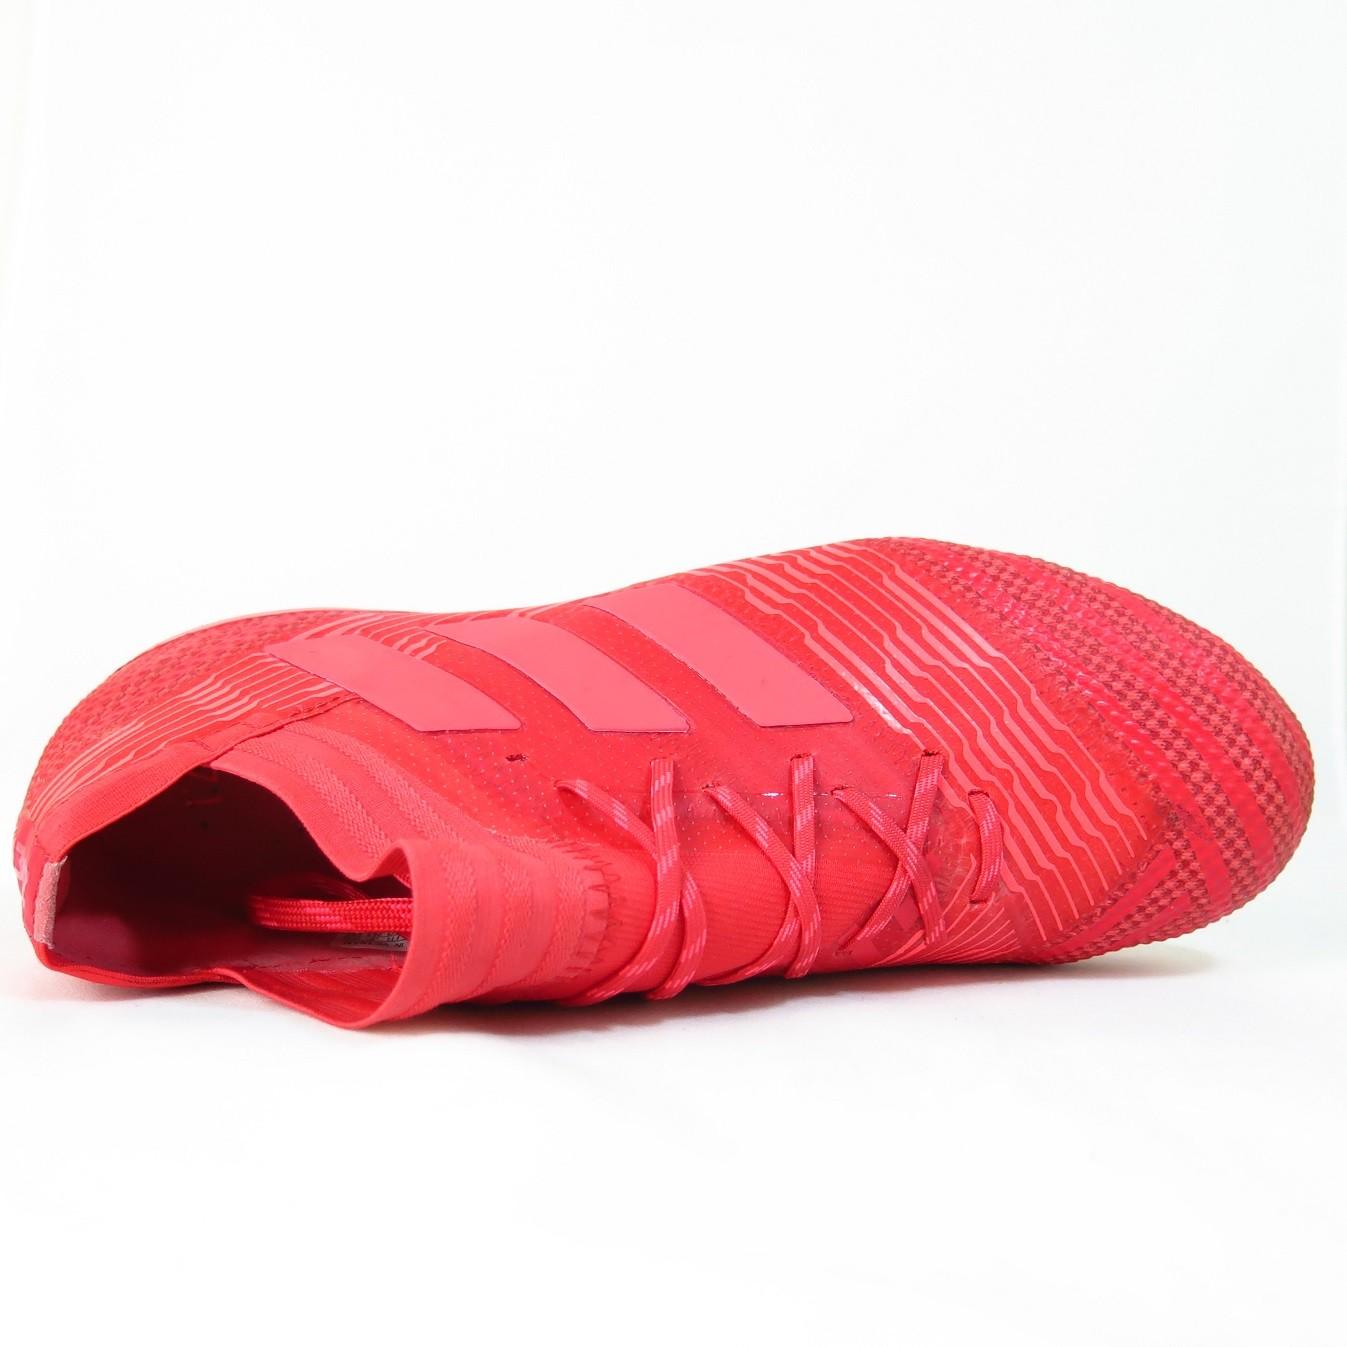 Chuteira Adidas Nemeziz 17.1 FG